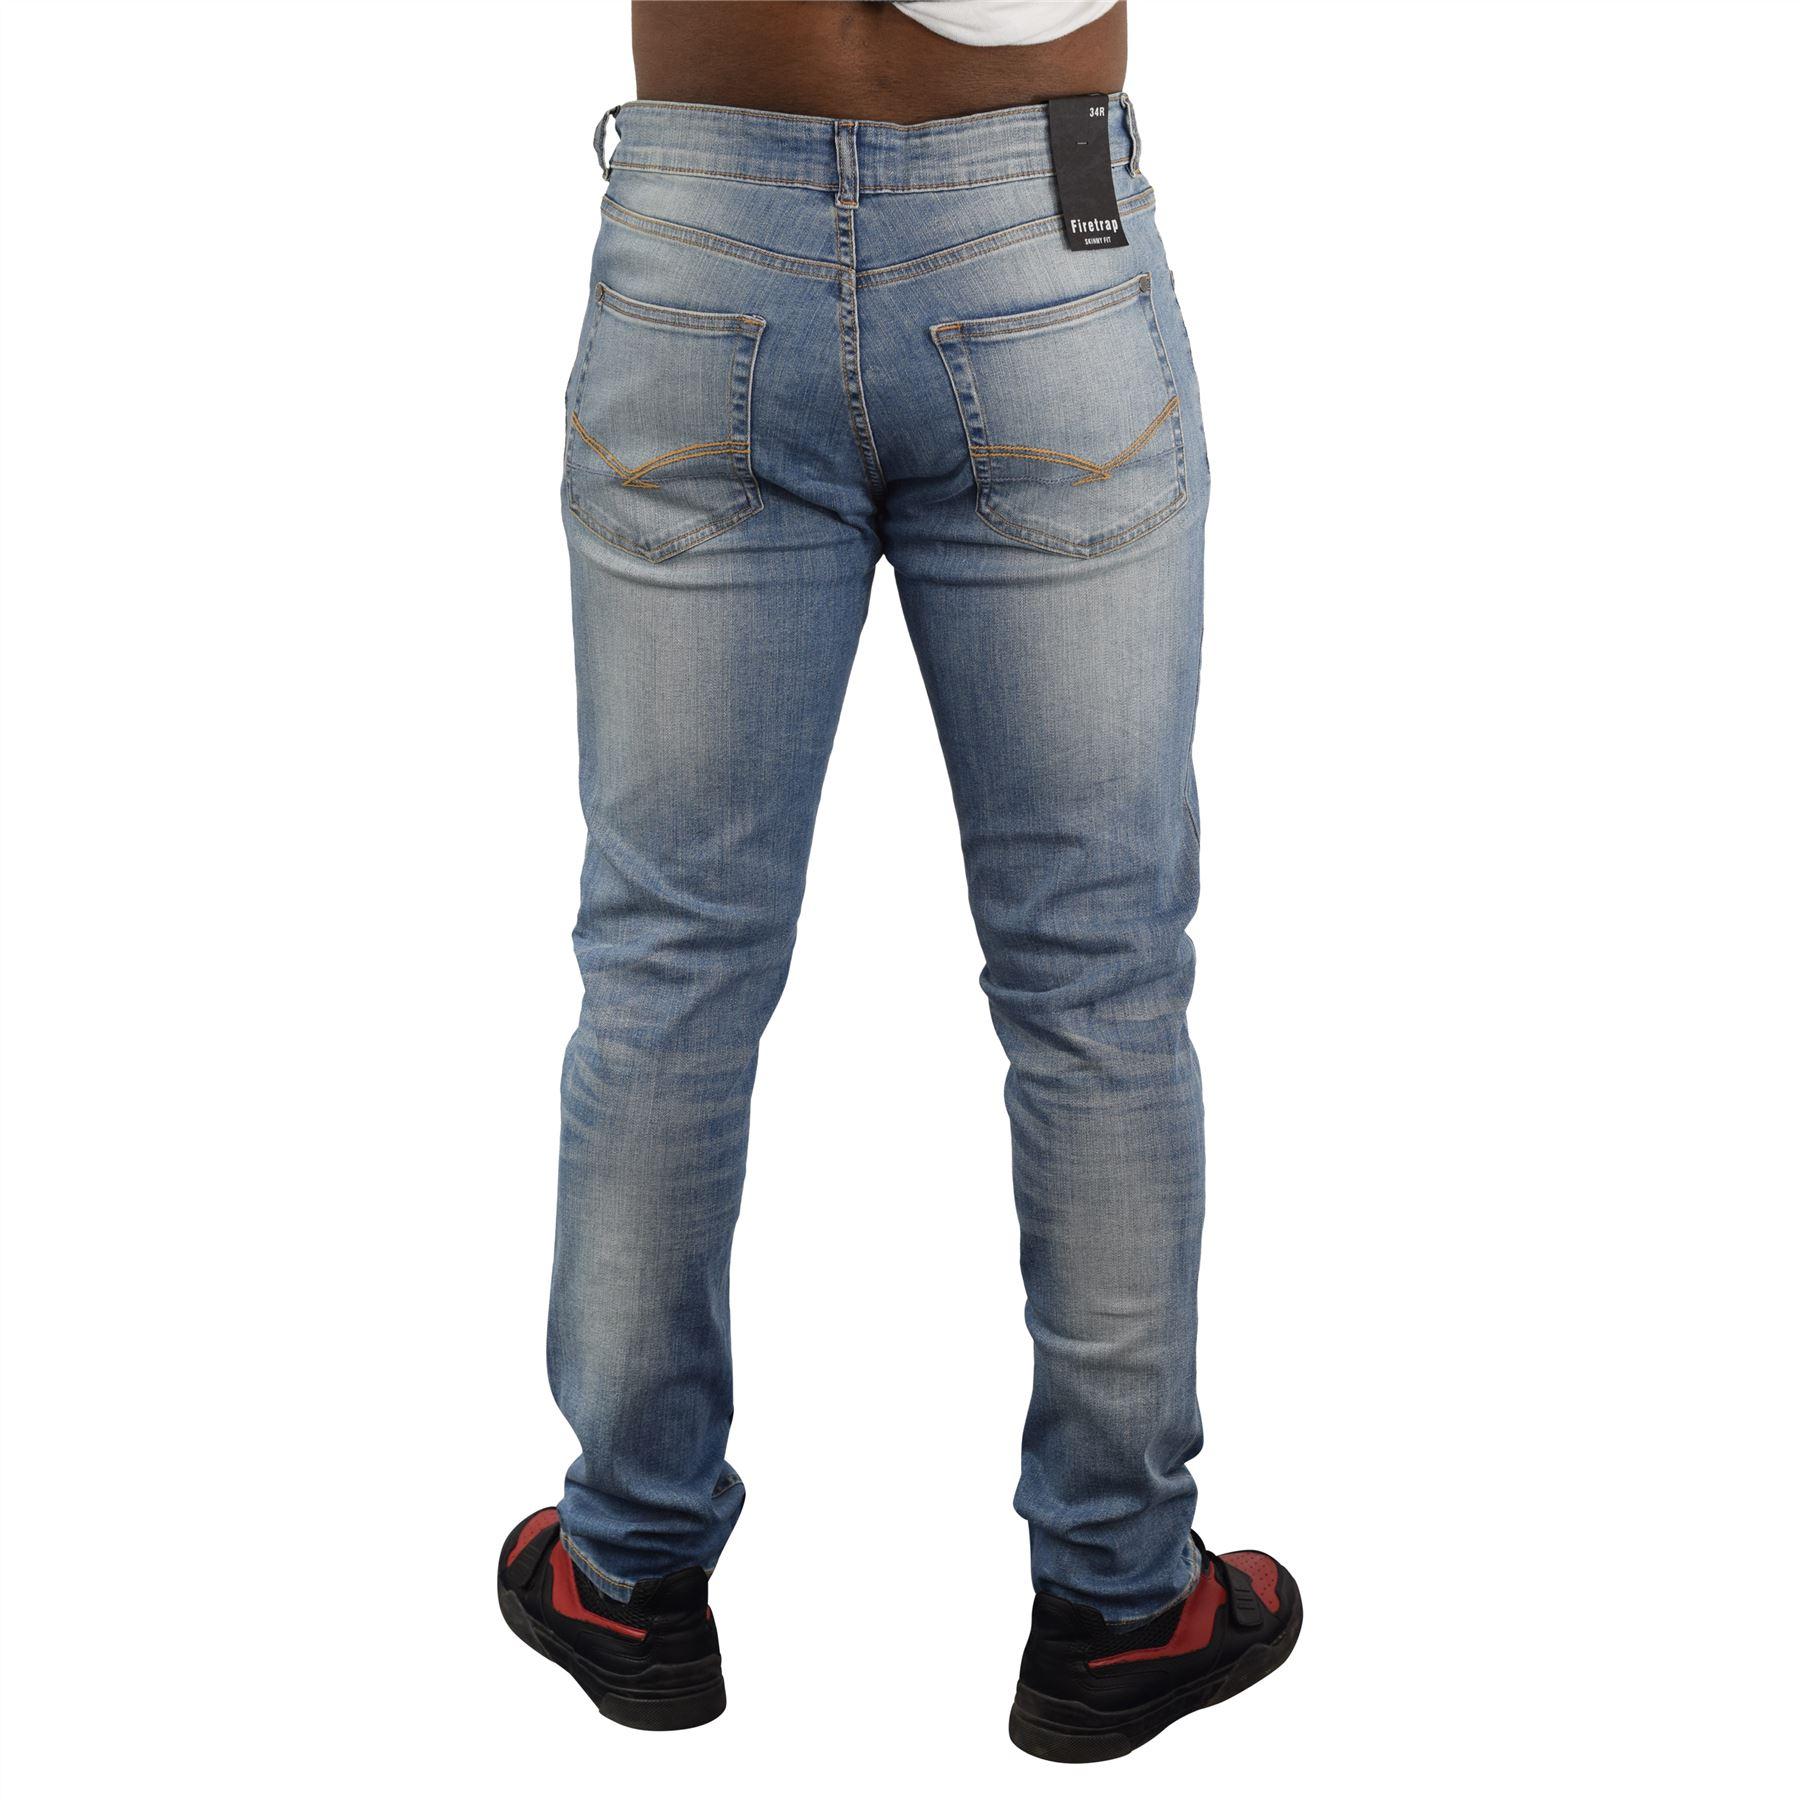 Nuevo-Para-Hombres-Firetrap-Jeans-skinny-fit-de-algodon-Pantalones-informales-Pantalones-de miniatura 3